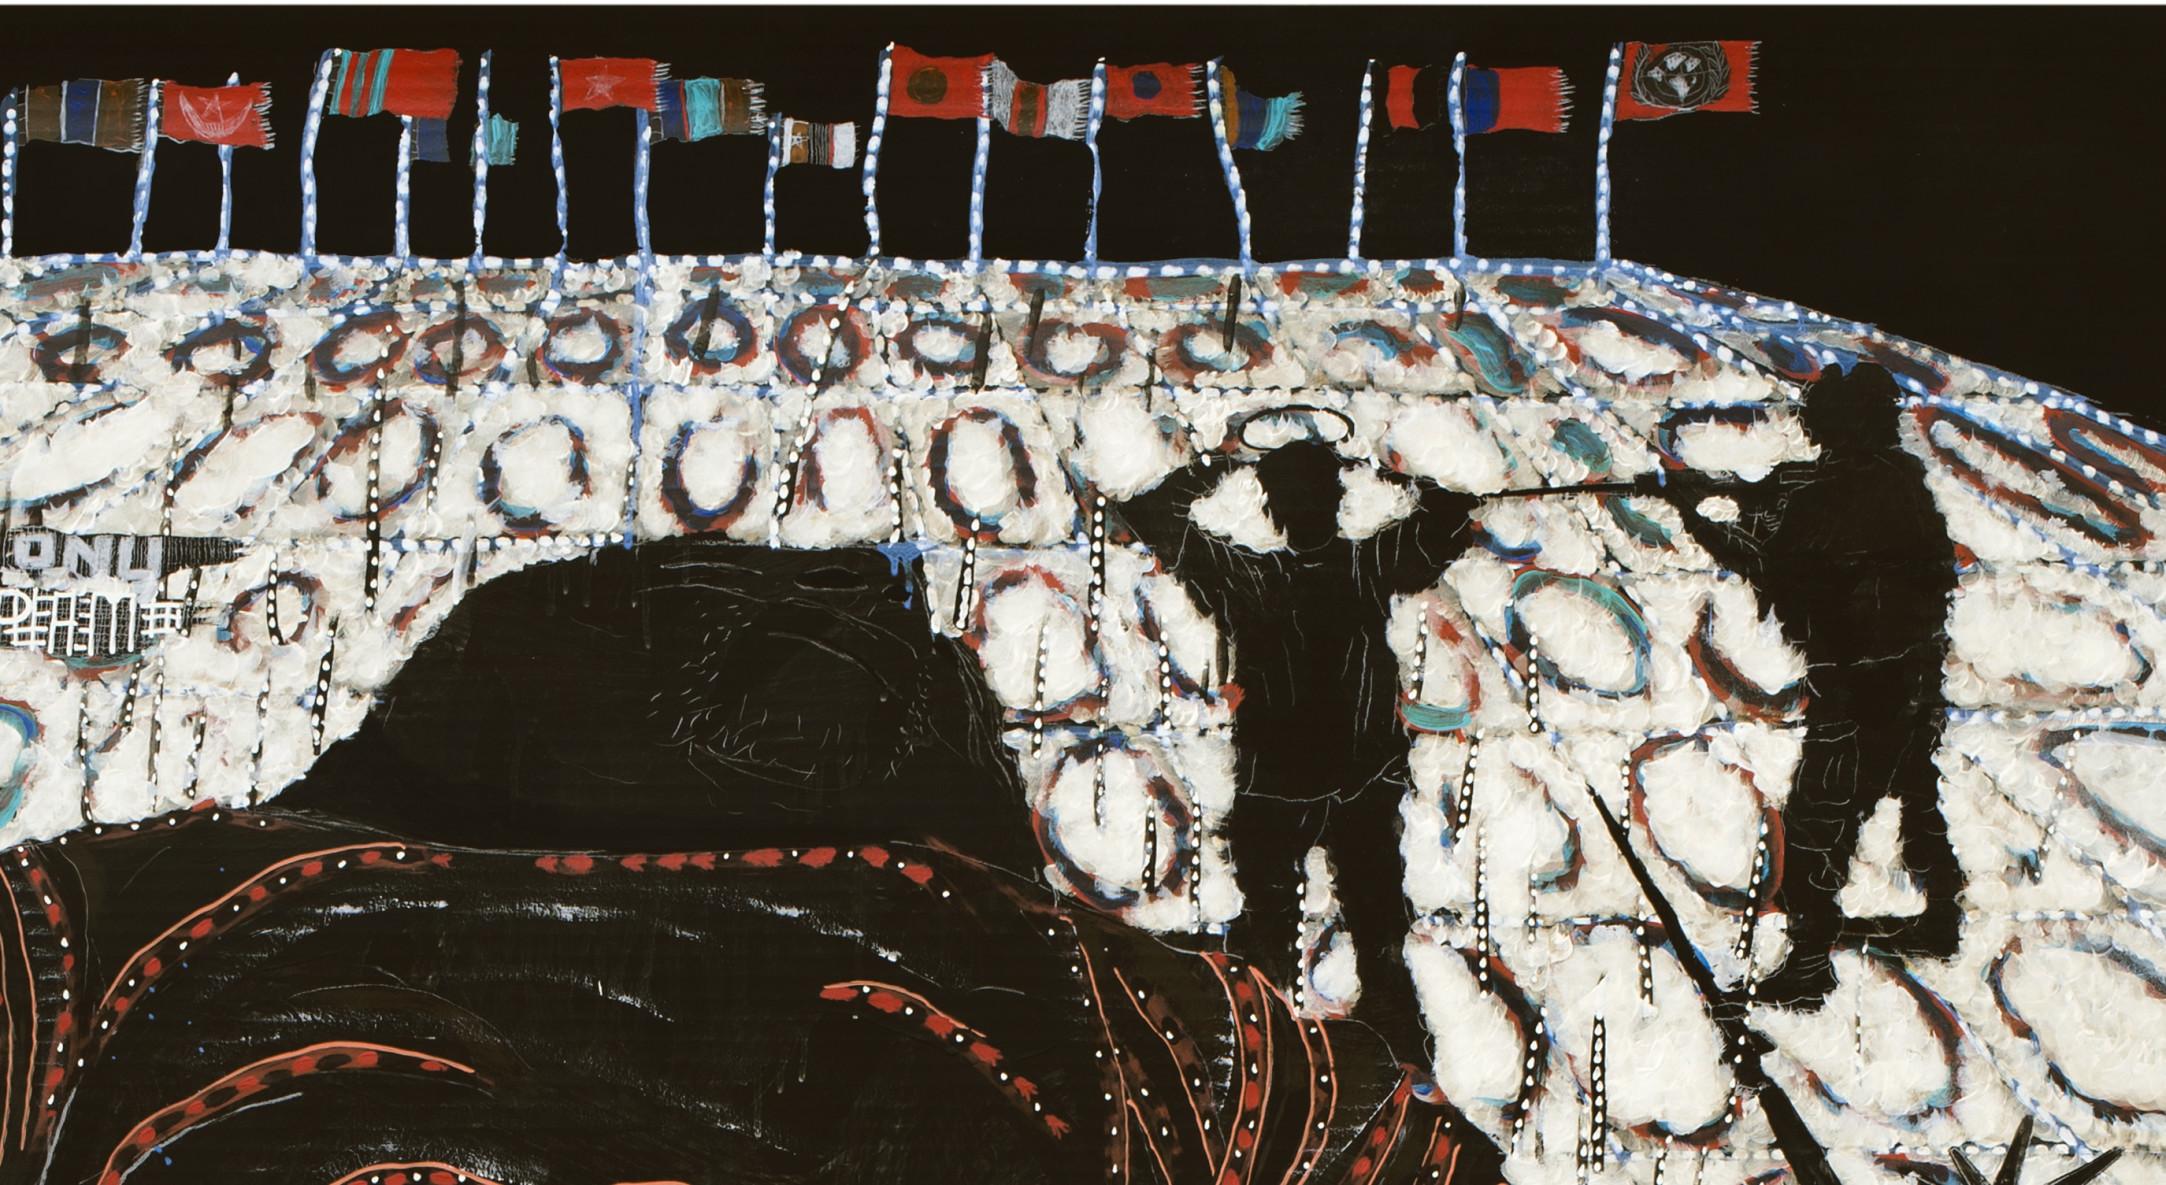 Detail of Omar Ba, Afrique, Afrique, Afrique, 2014, Oil, gouache, ink, and pencil on corrugated card, 190 x 143 cm, 74 3/4 x 56 1/4 in